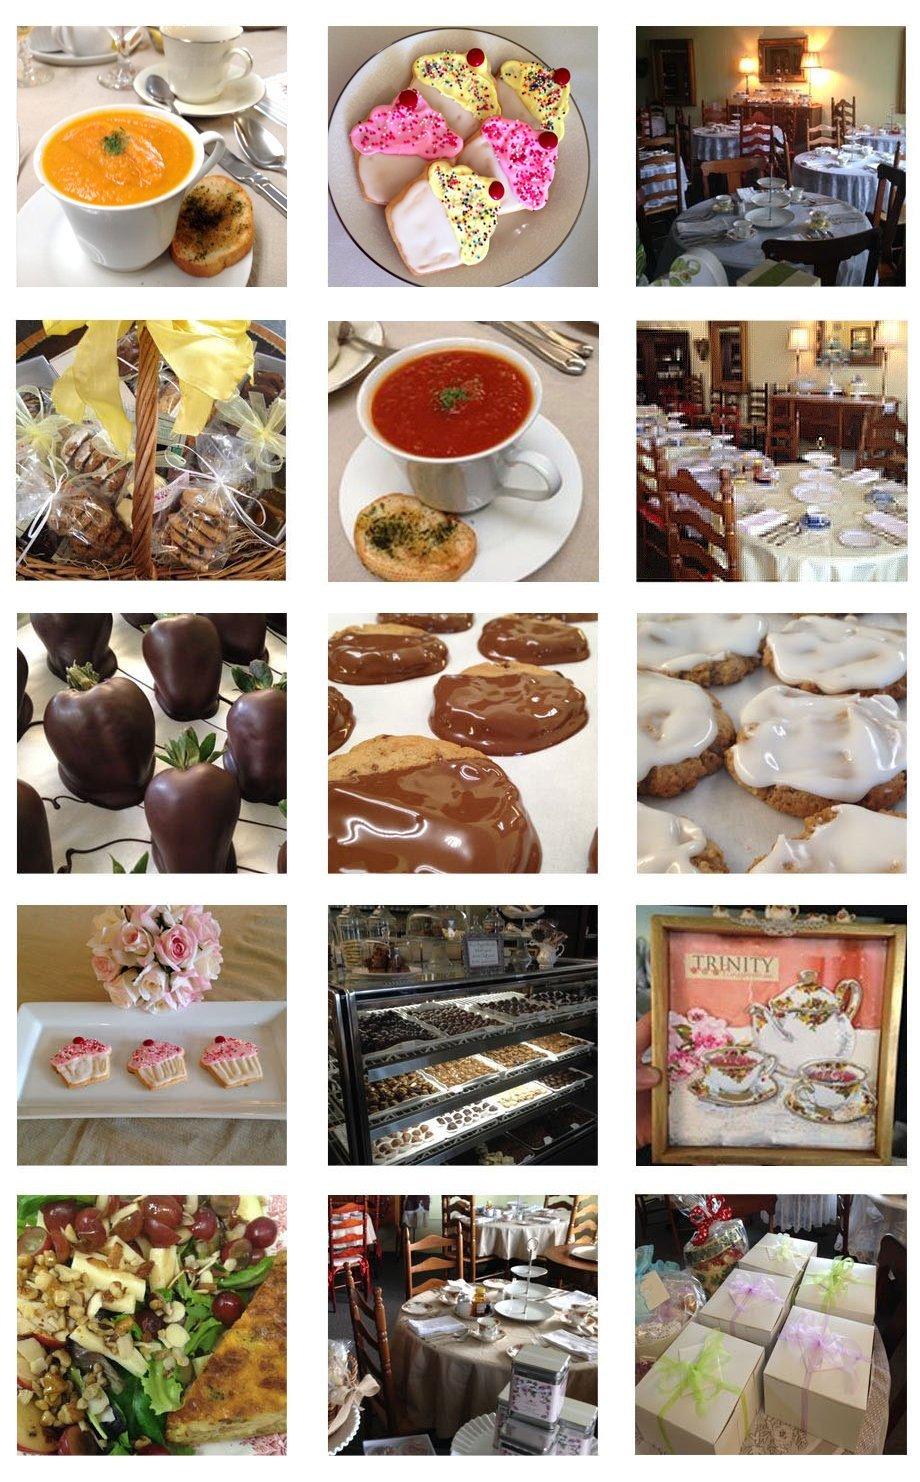 Trinity Confections - Warwick, RI